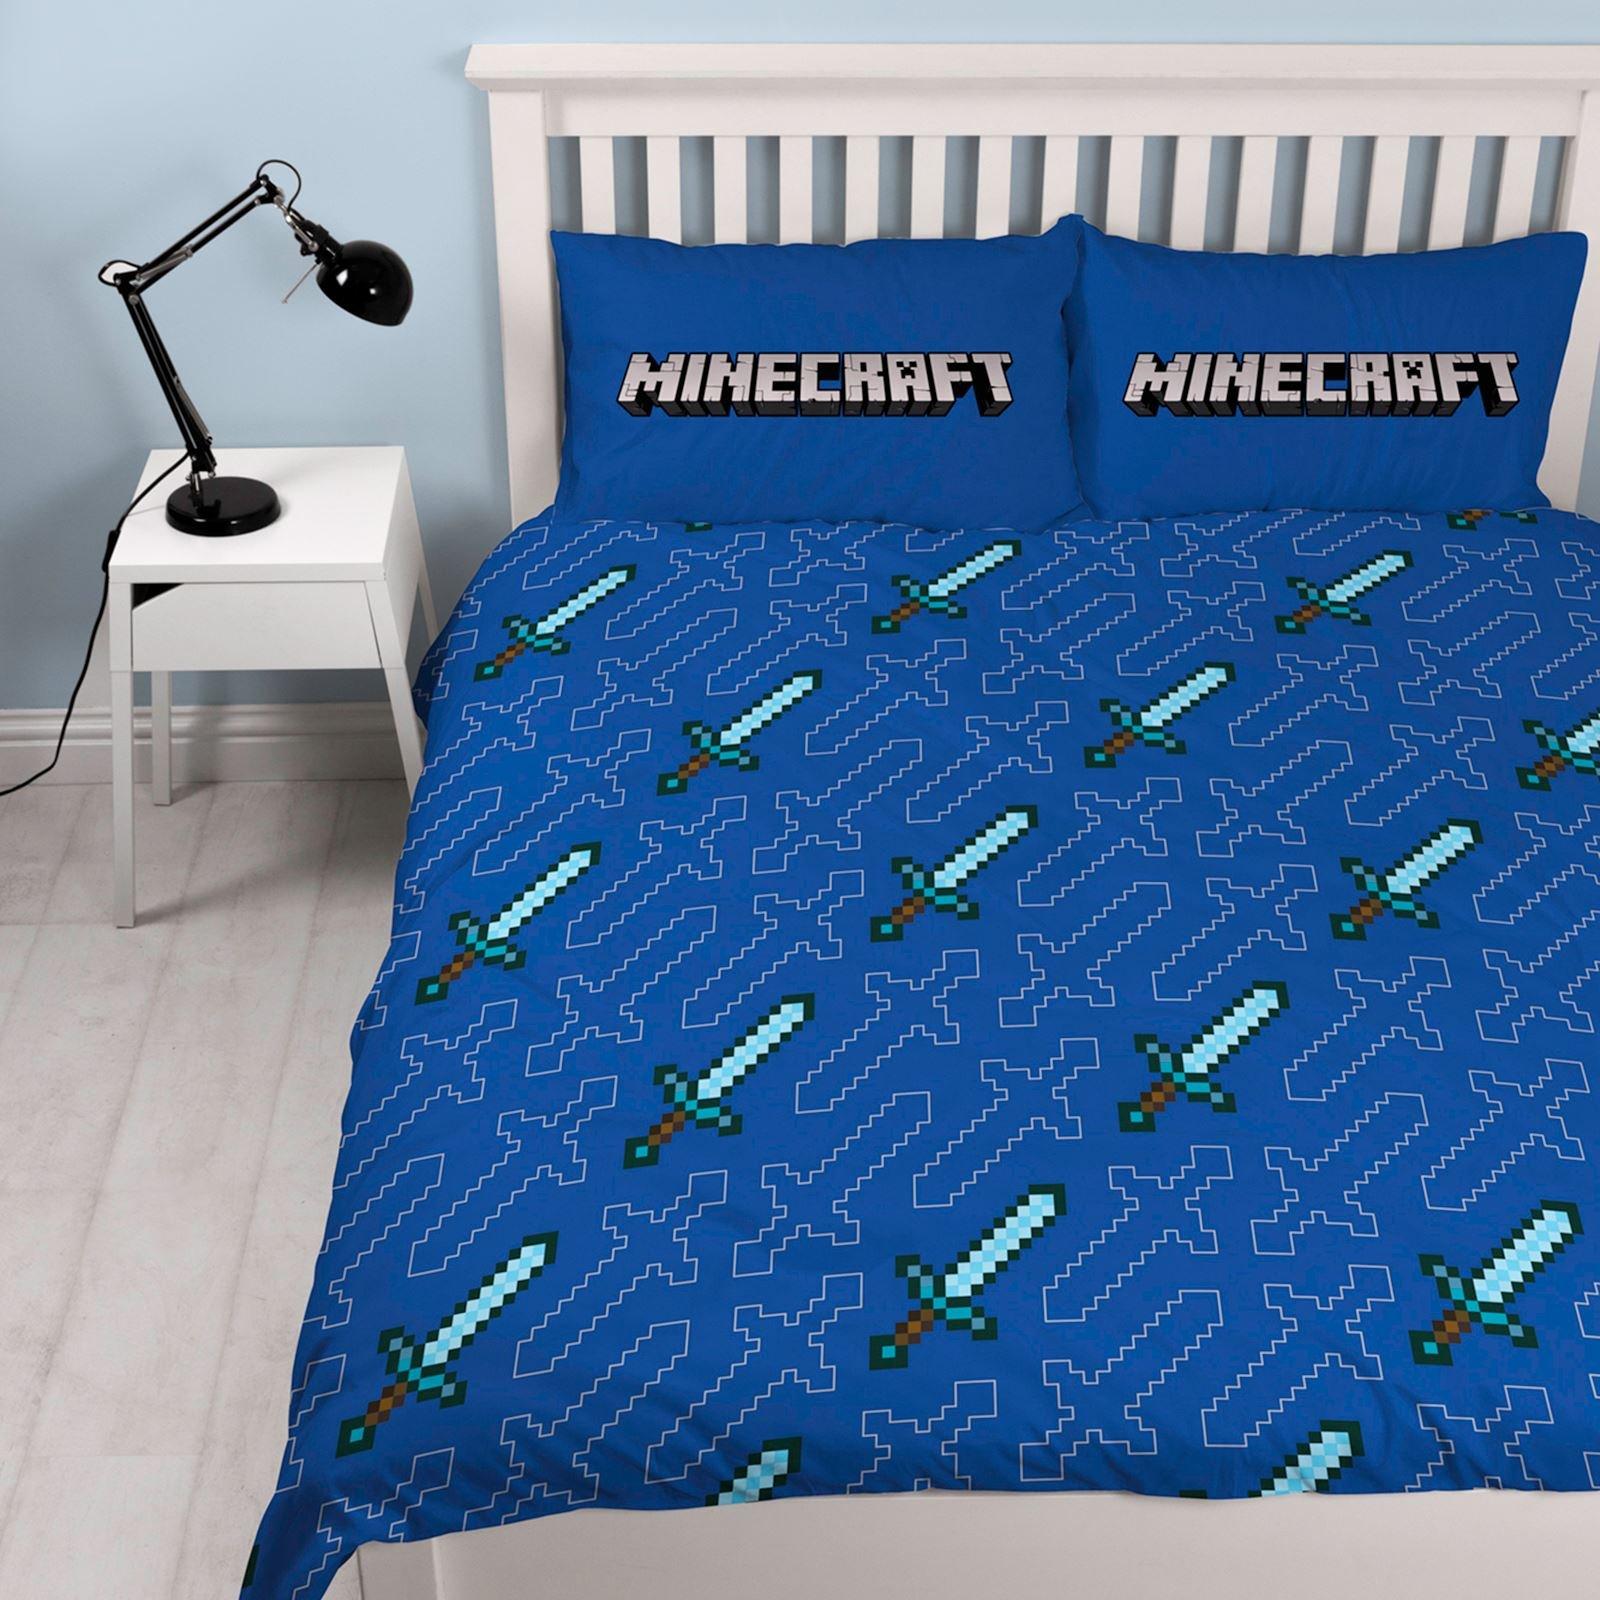 Minecraft 'Good Guys' Double Duvet Set - Large Print Design